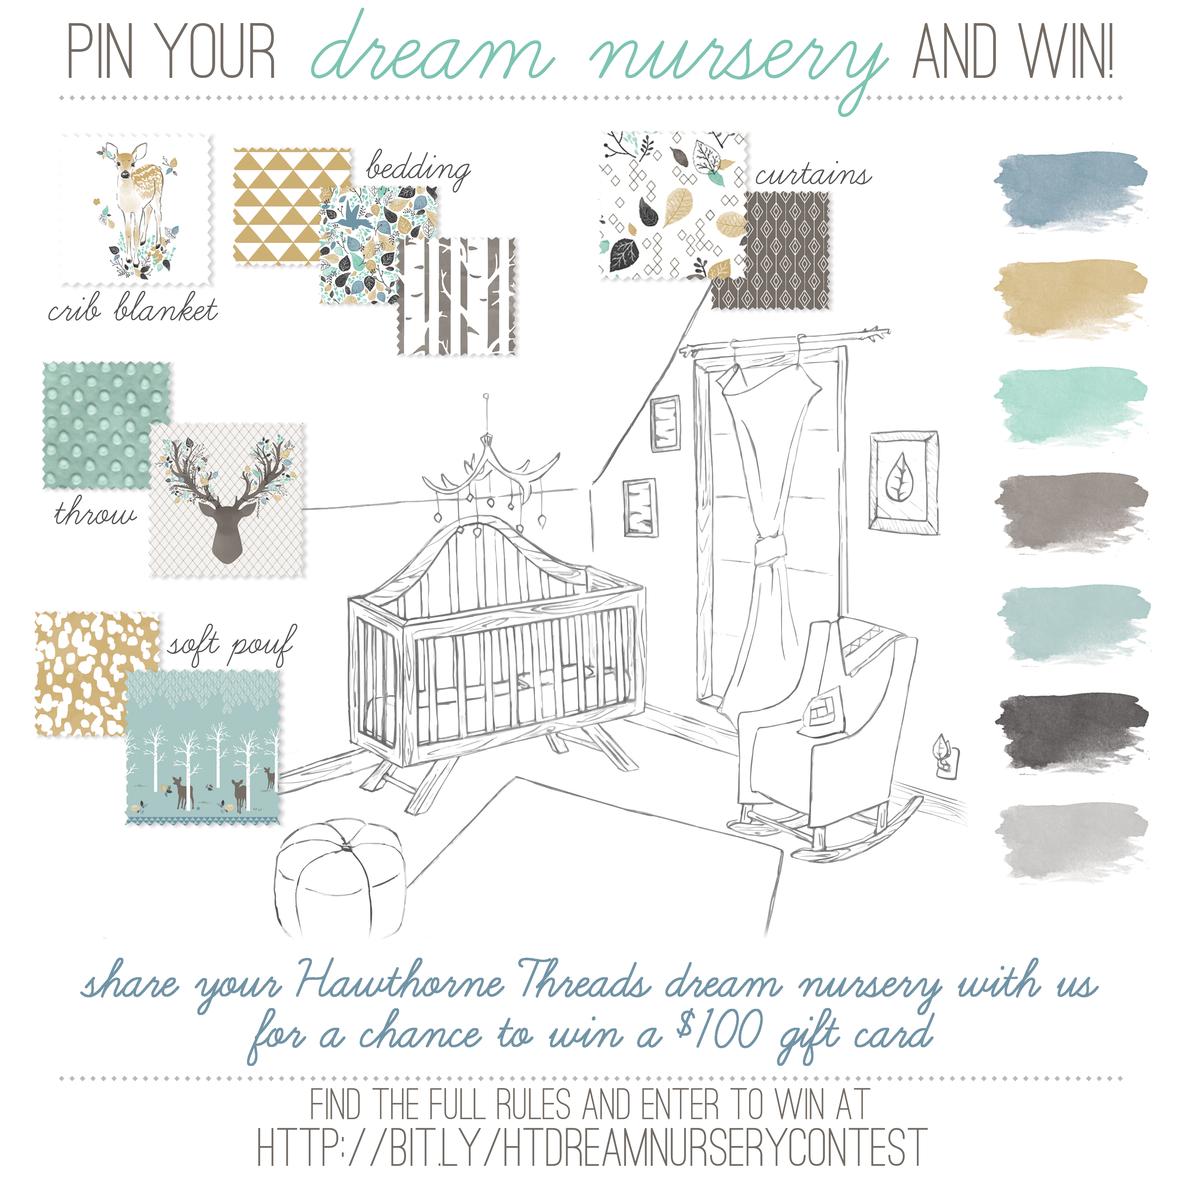 Fawn nursery contest promo image full size